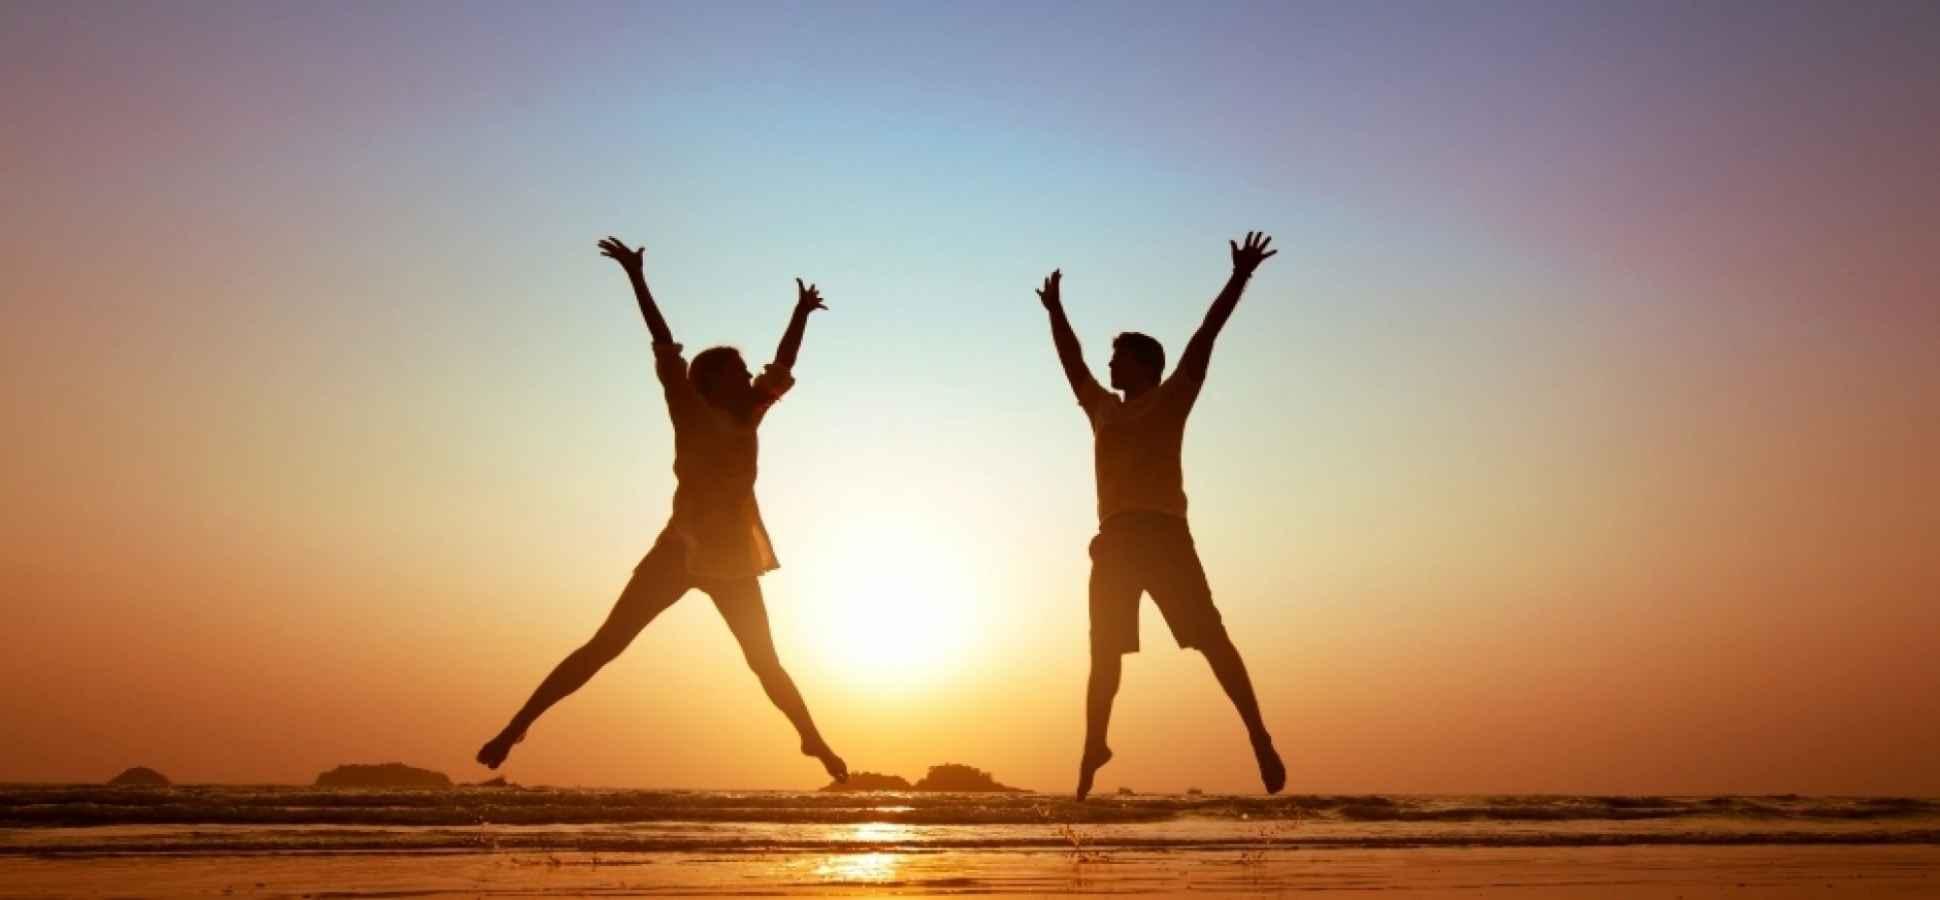 10 Proven Habits of Happy People